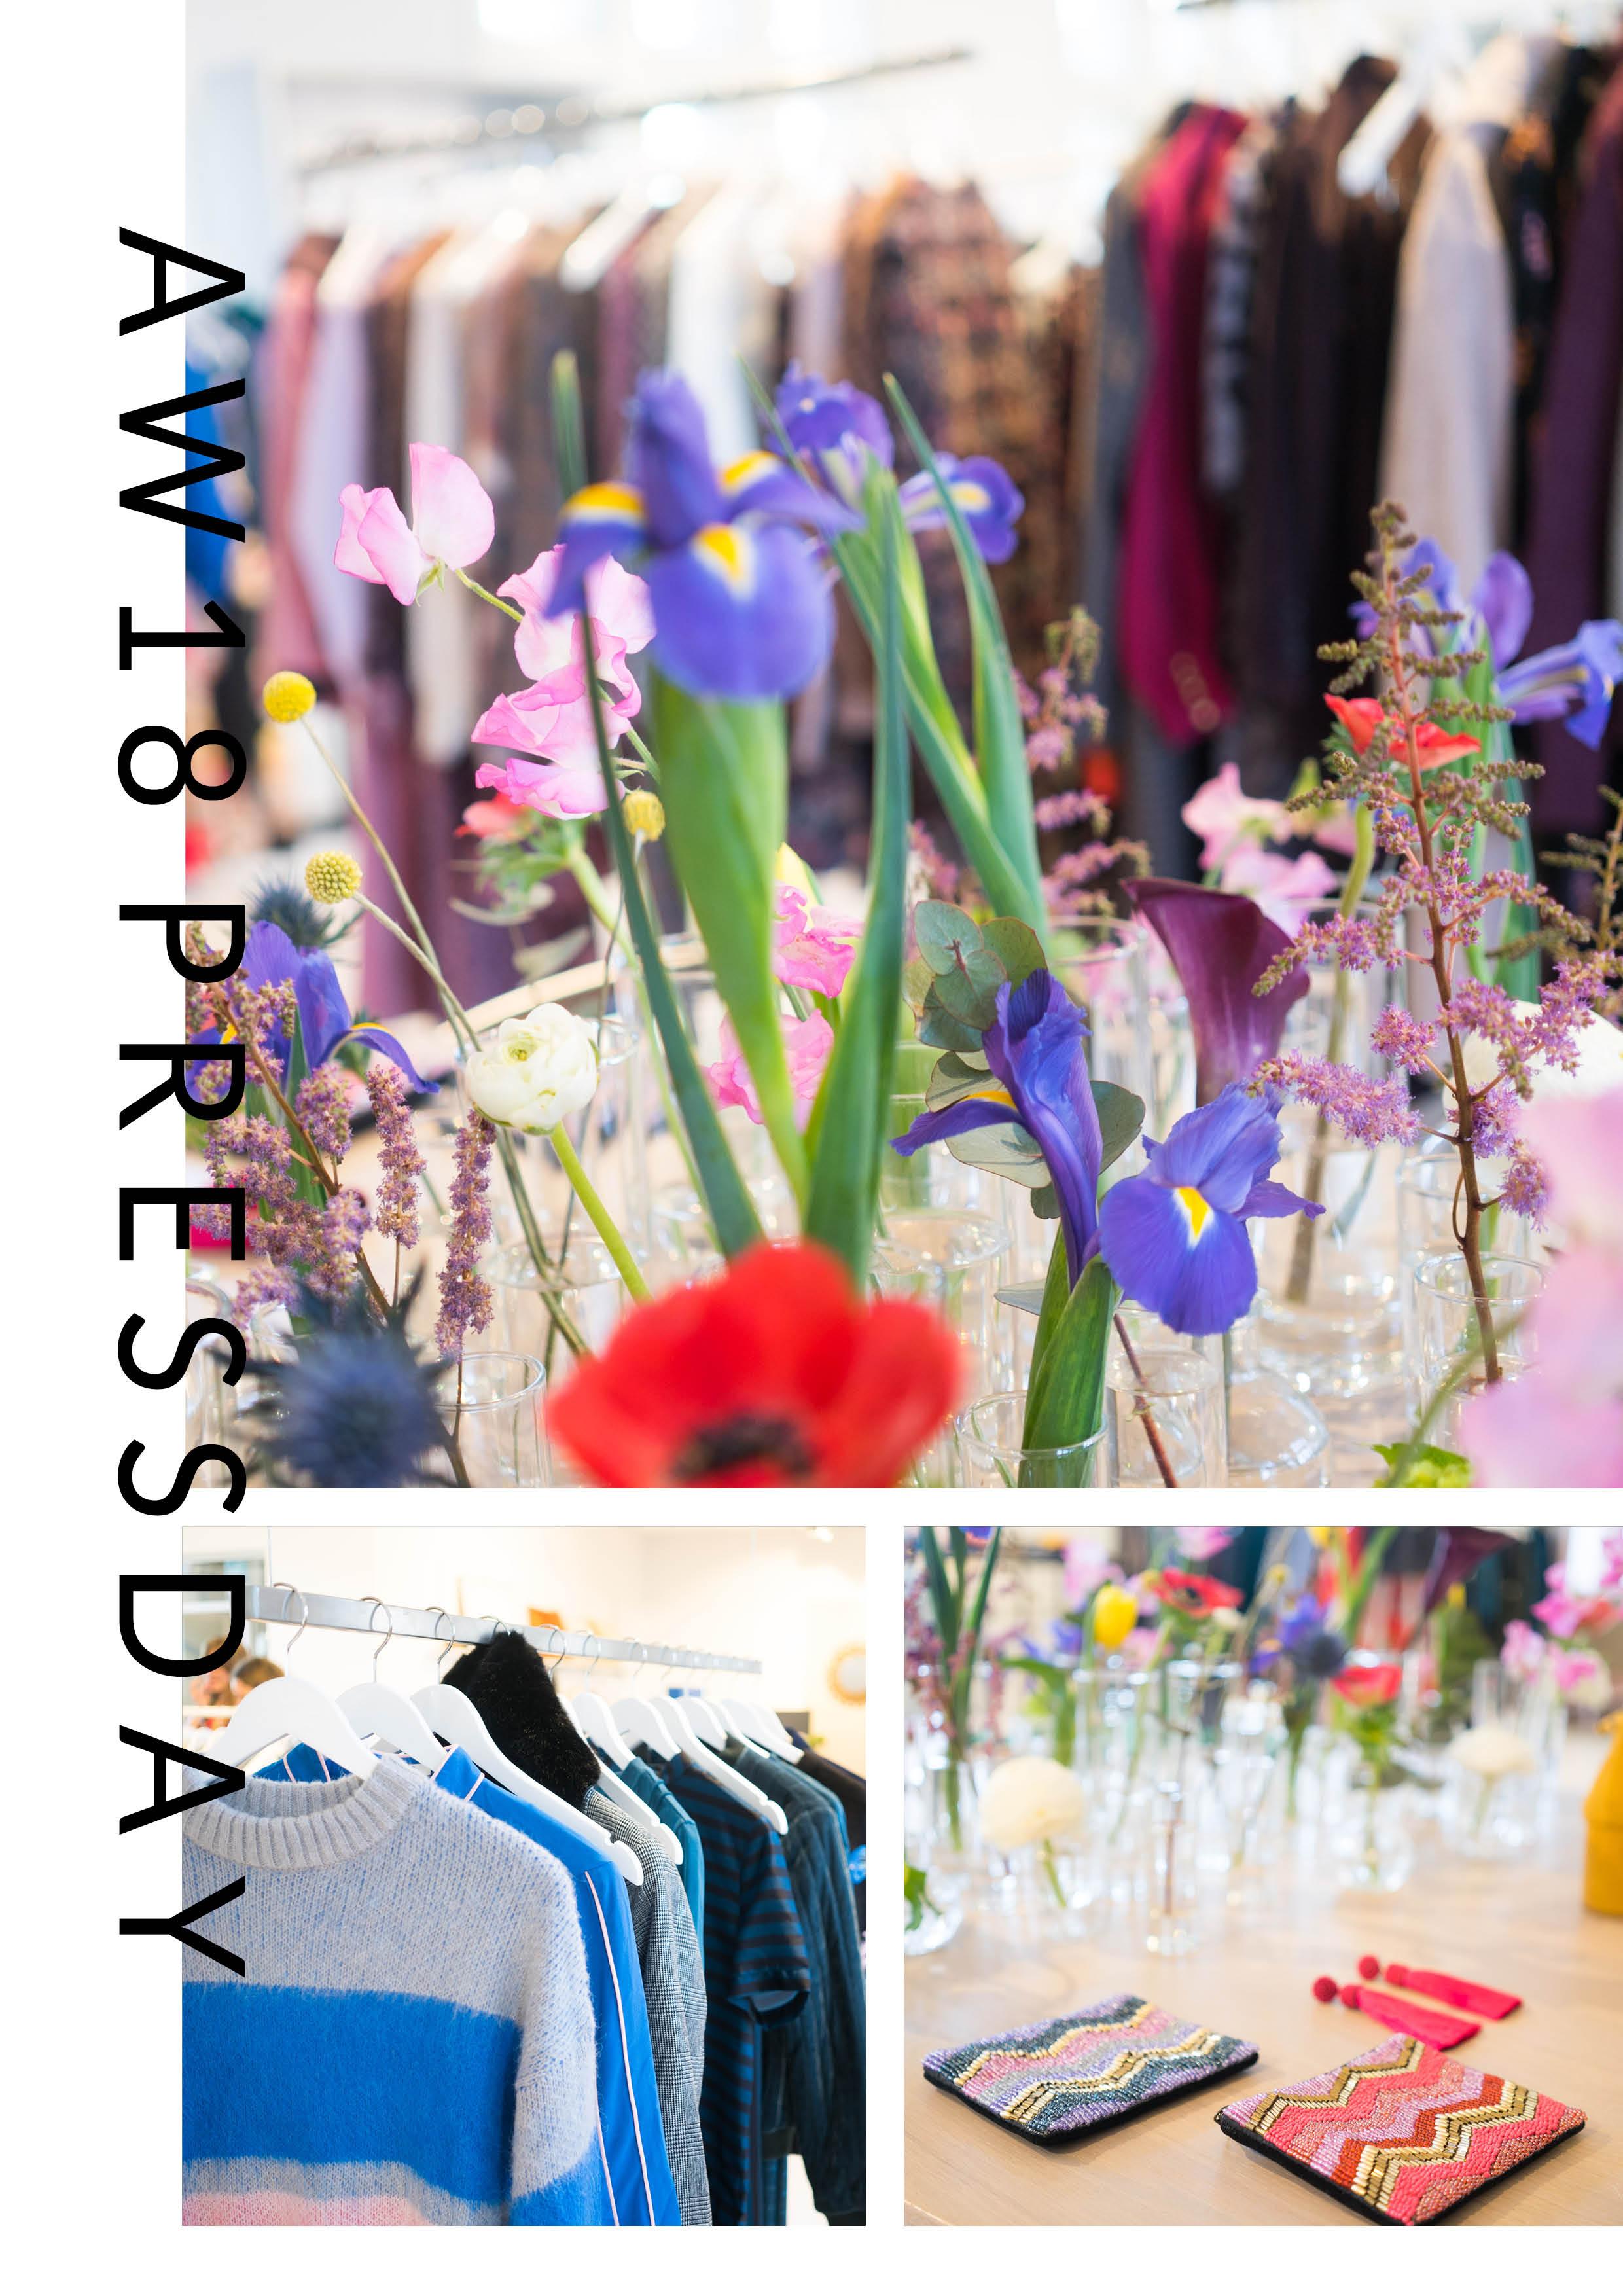 pressday_aw18